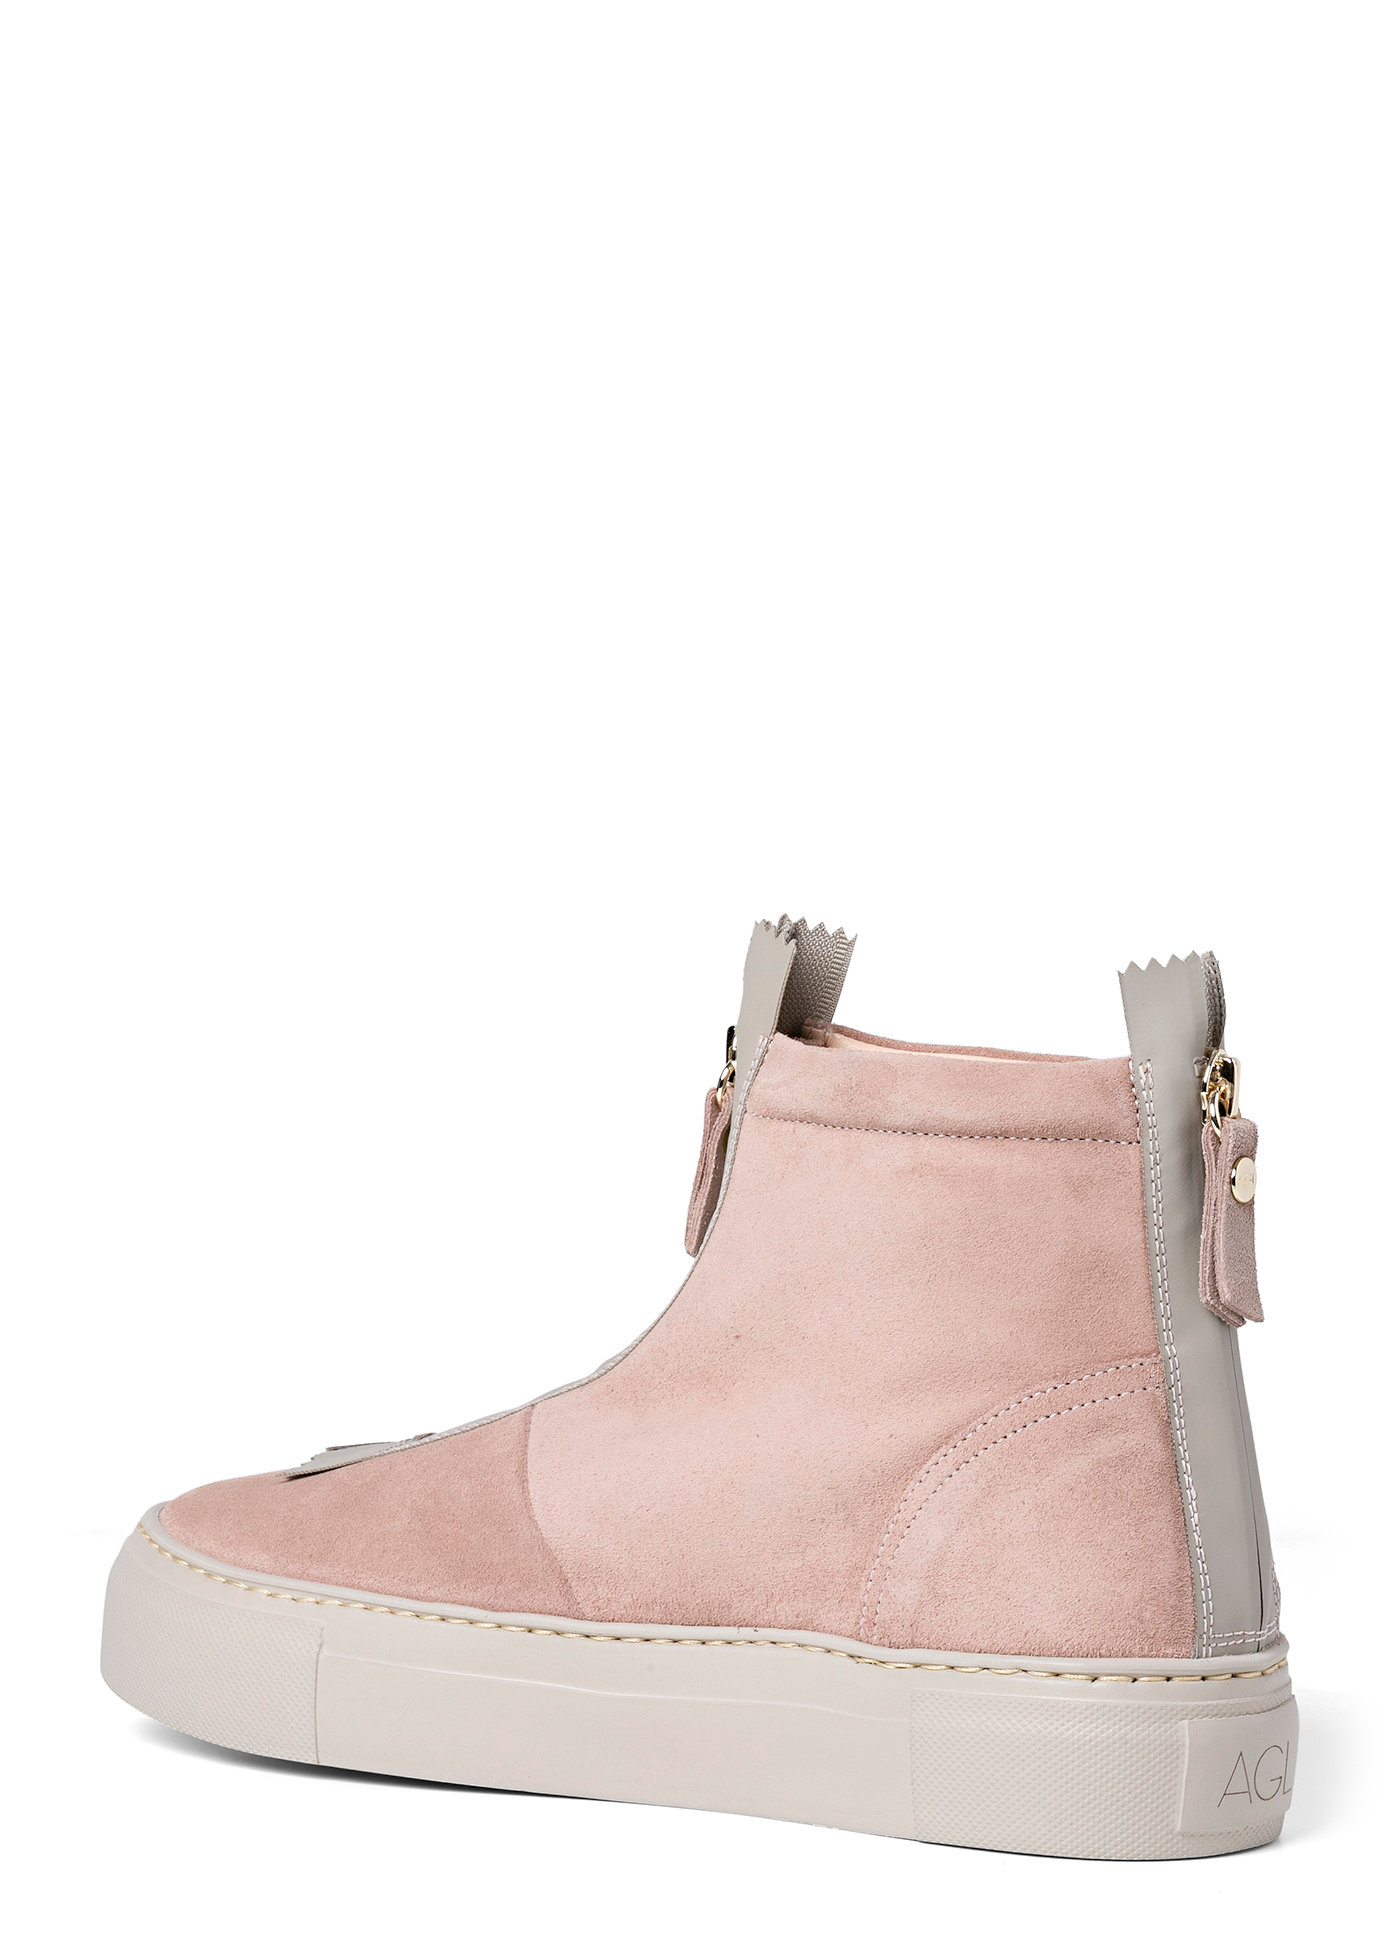 MAEVA Sneaker Boot image number 2